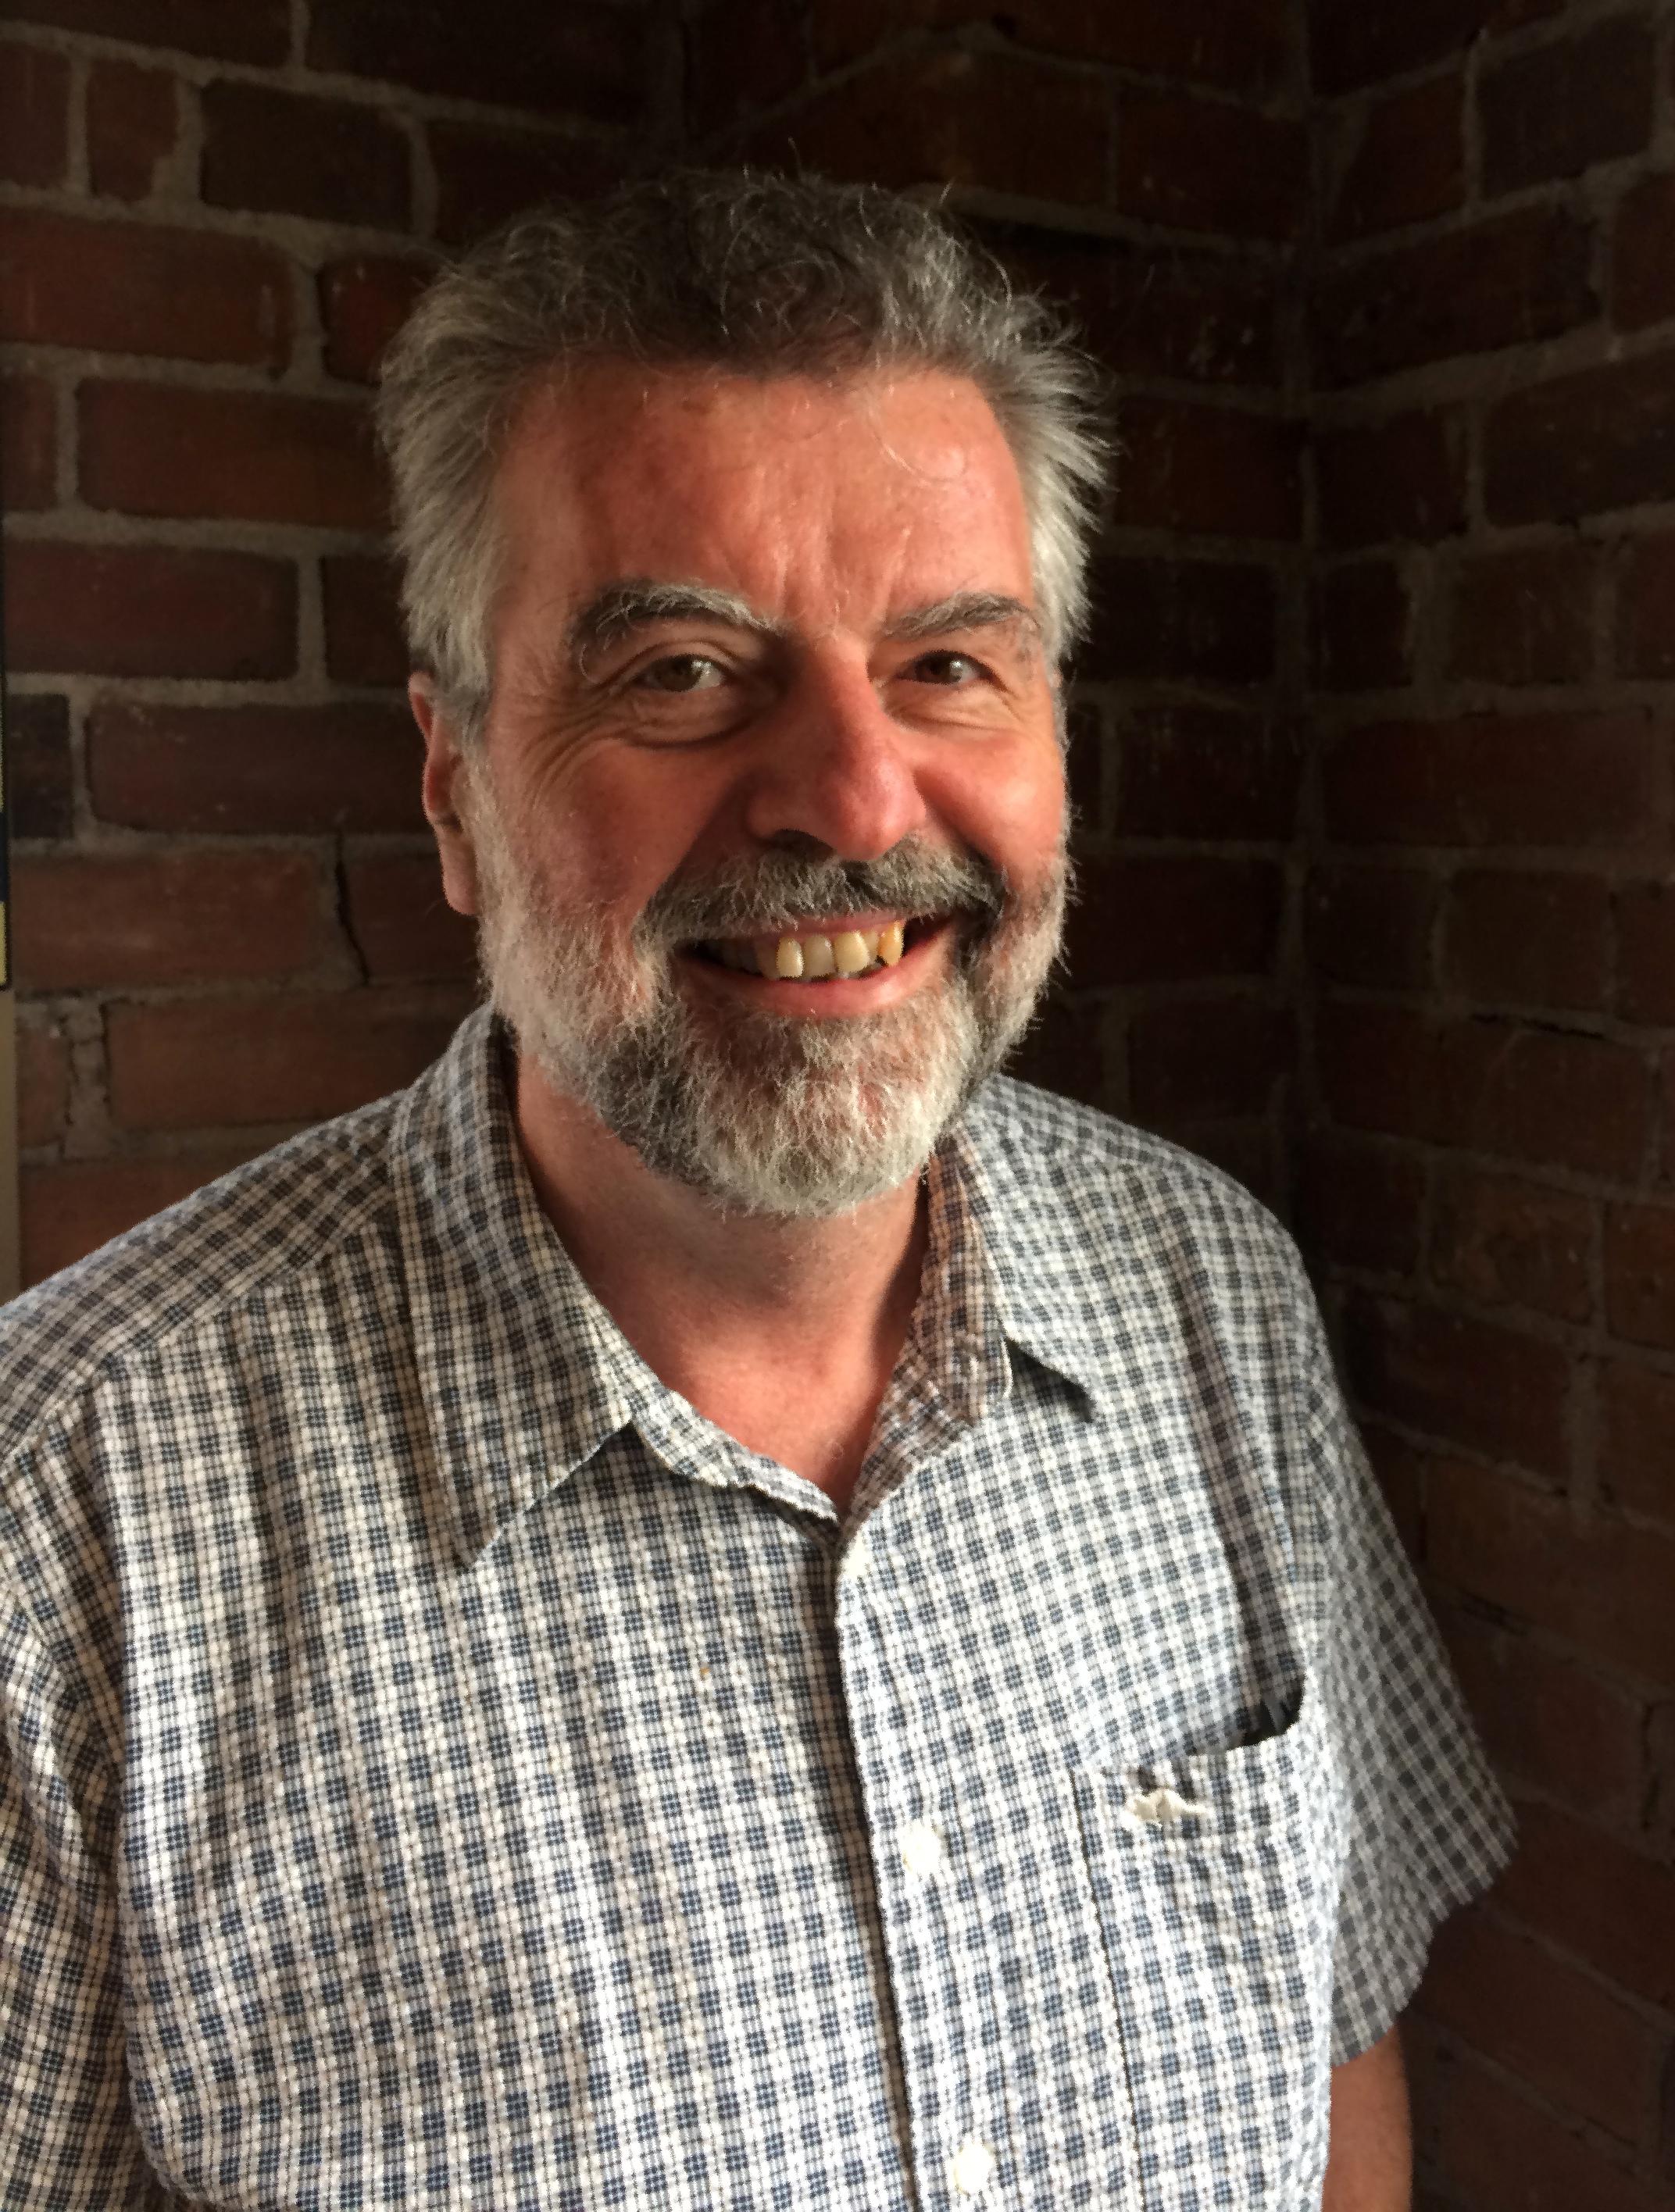 Headshot of Colin MacAdam